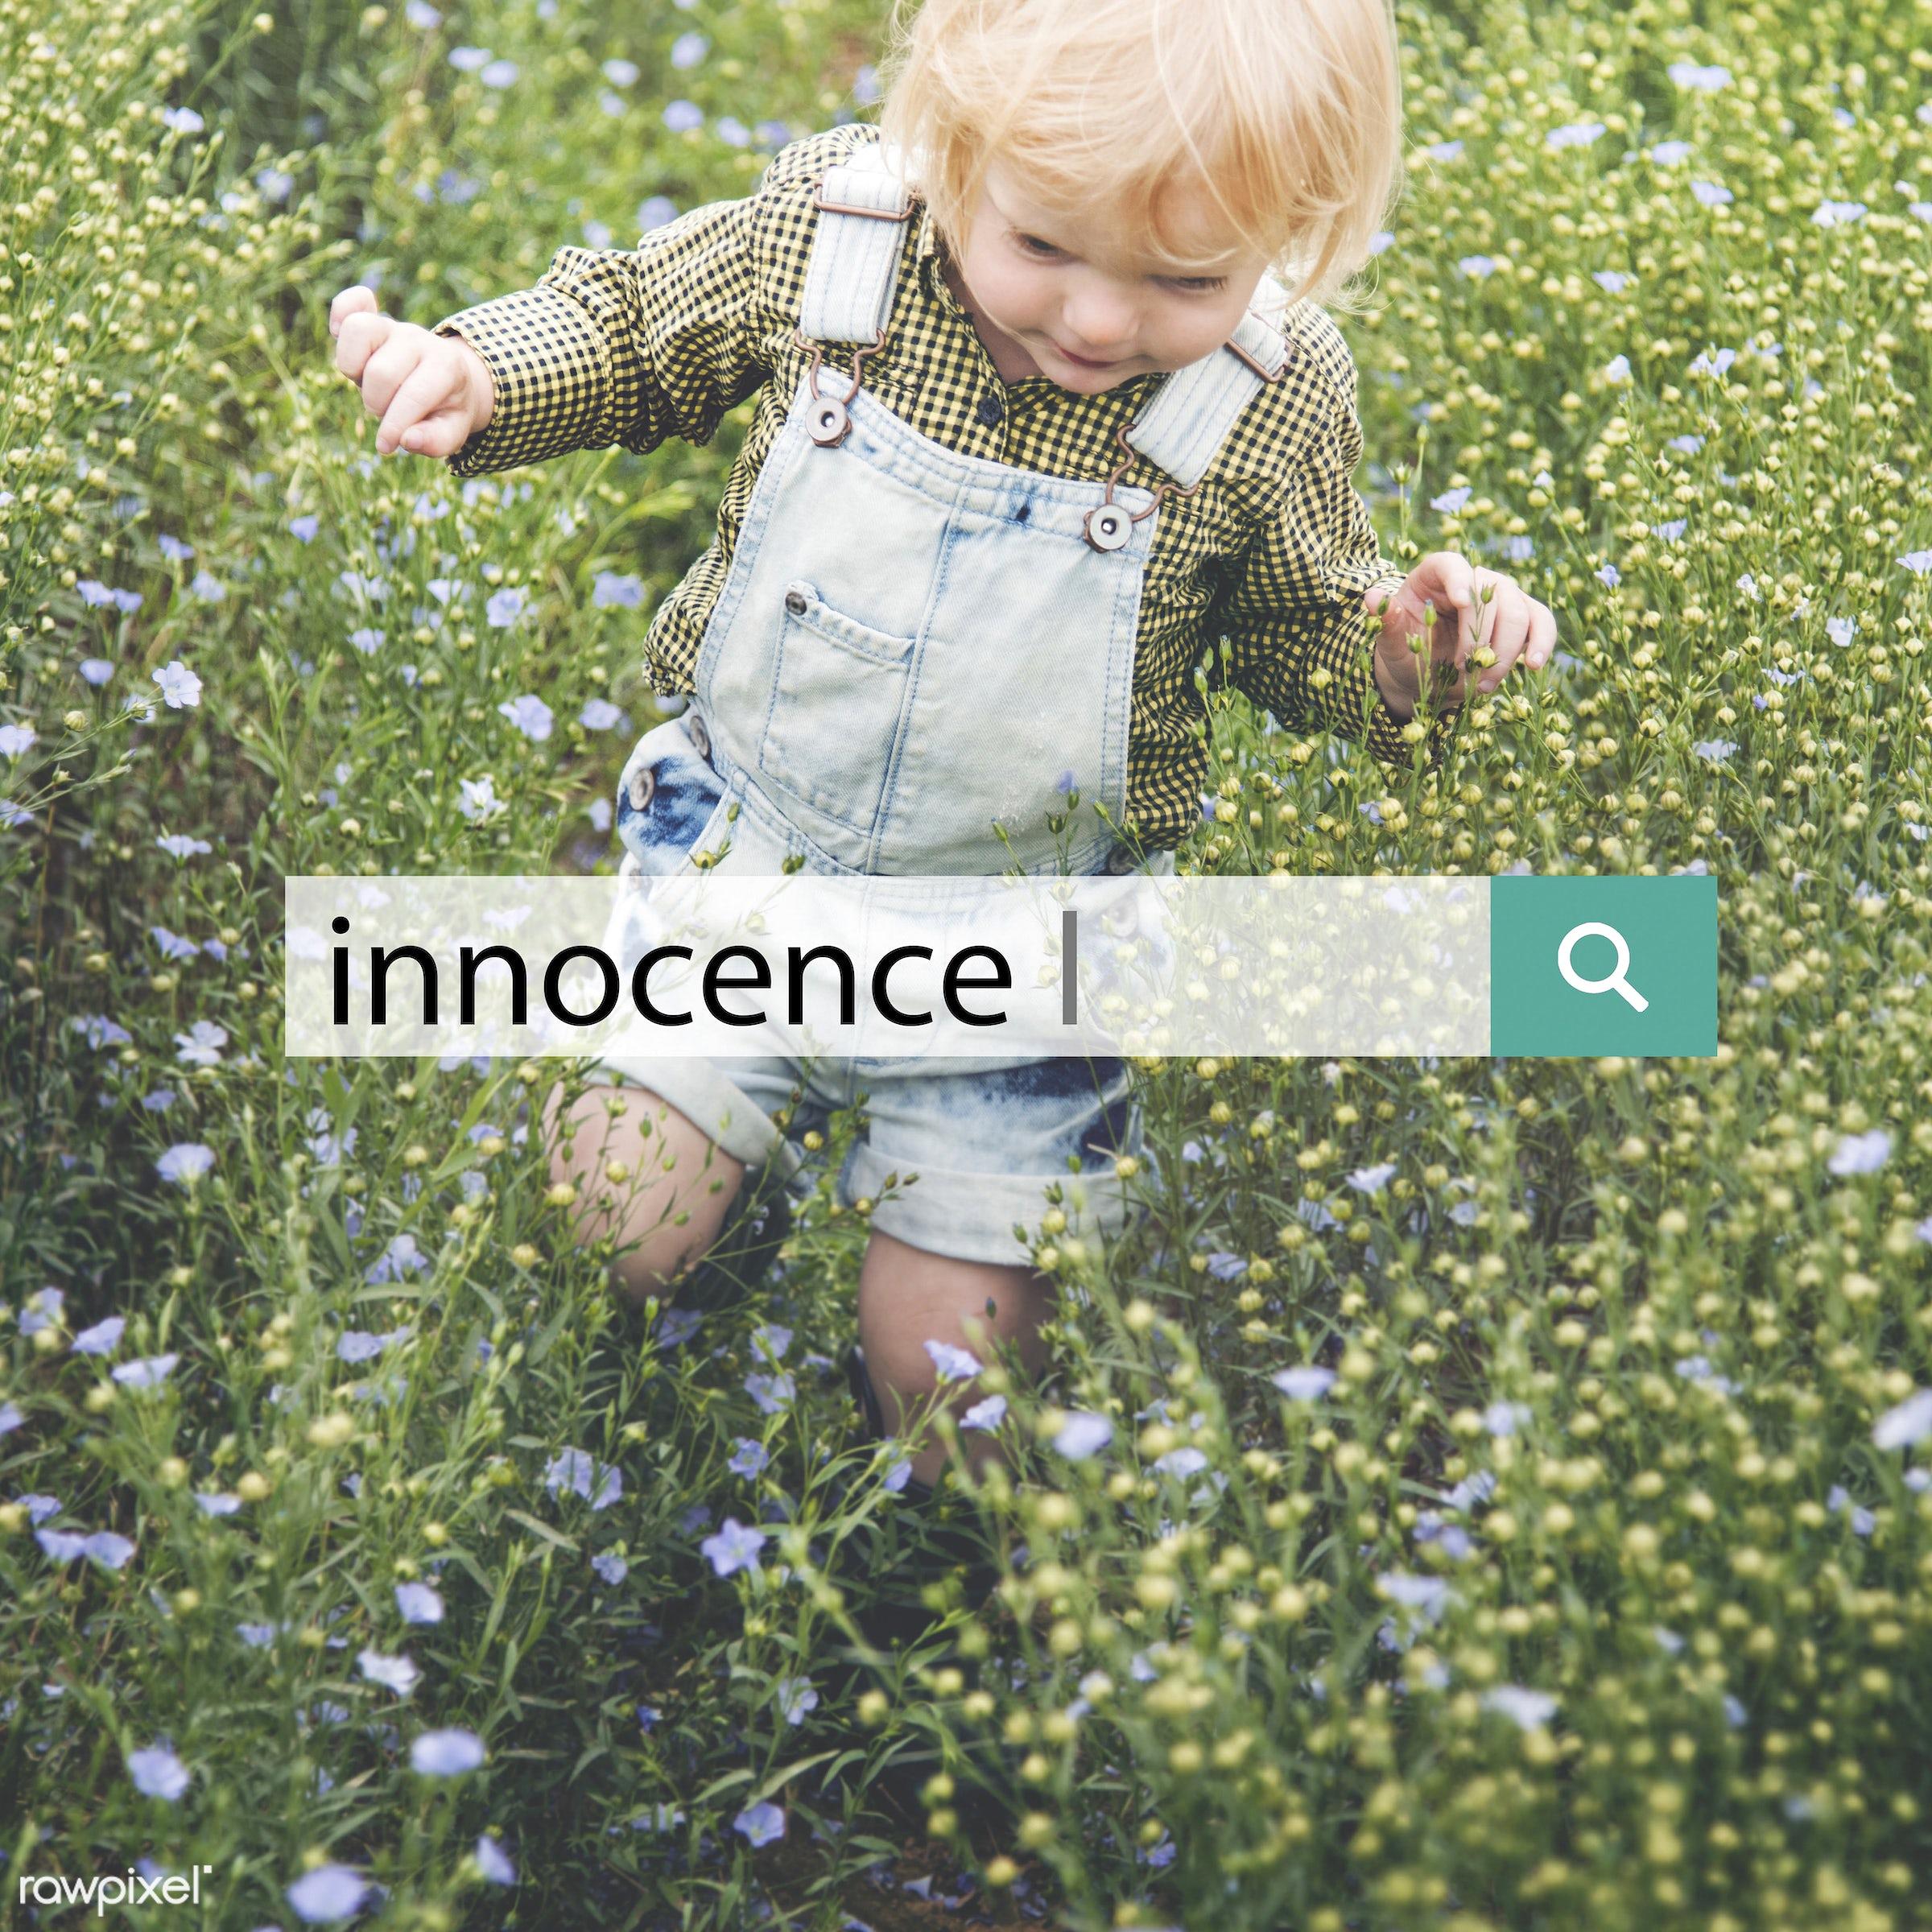 adorable, baby, blameless, blonde, boy, caucasian, child, childhood, children, curiosity, curious, cute, dungarees, flower...